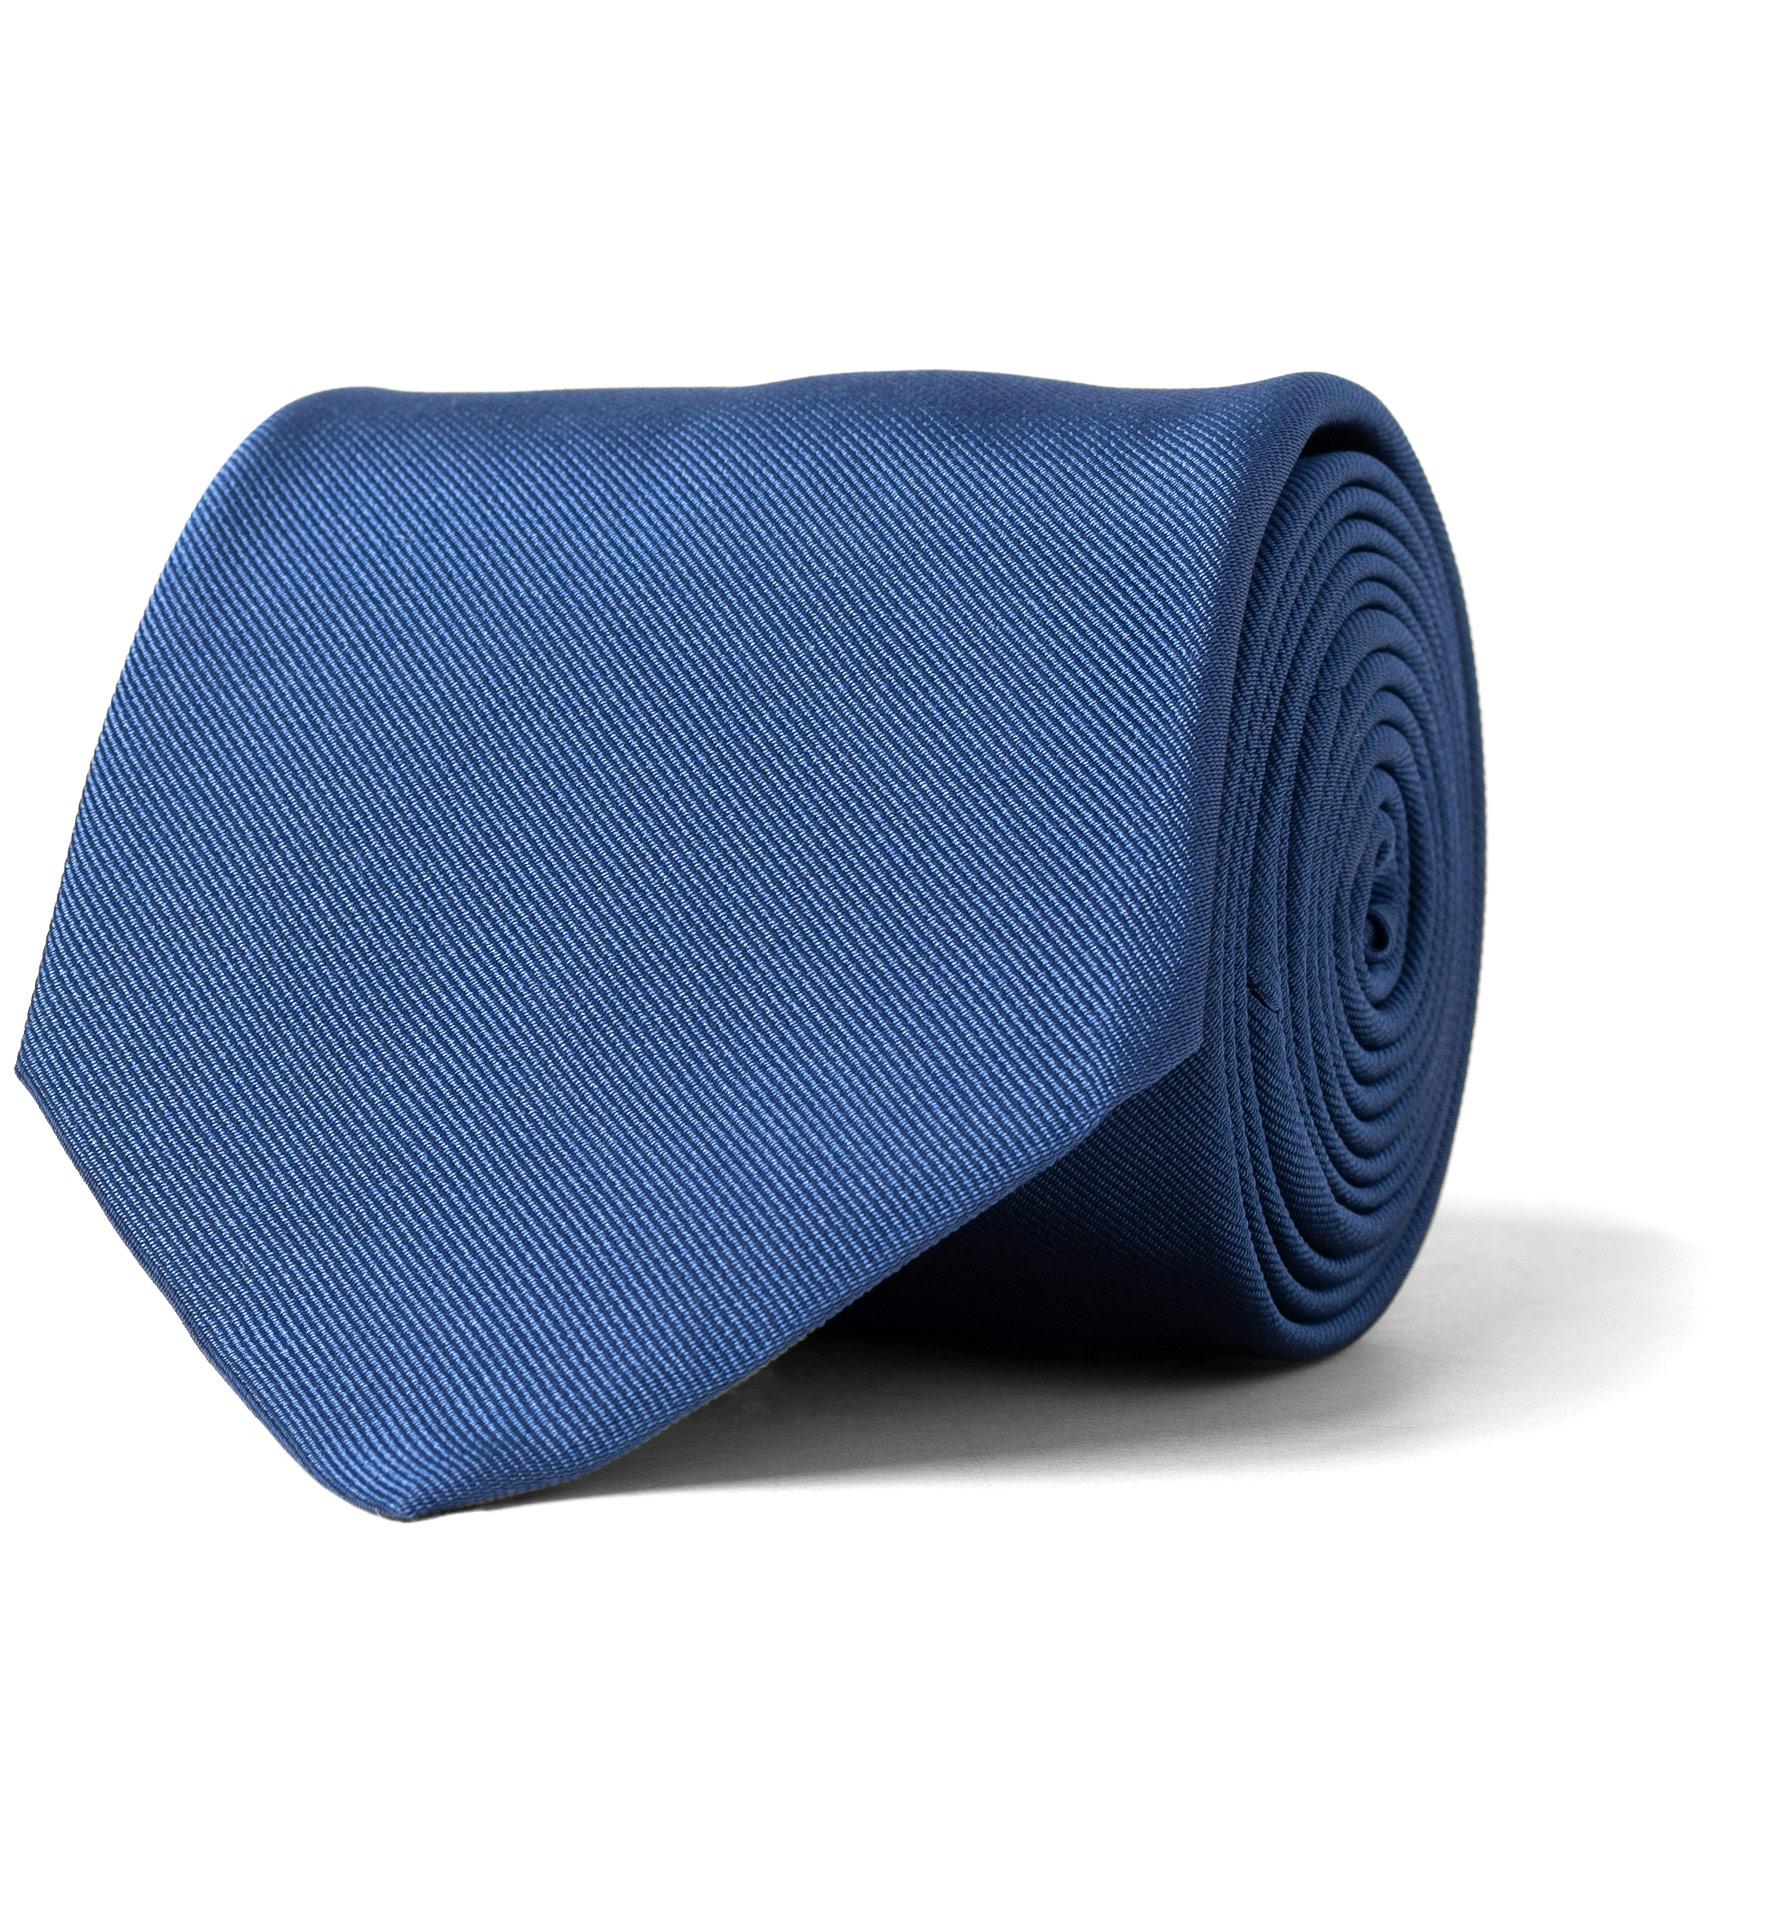 Zoom Image of Storm Blue Silk Repp Tie